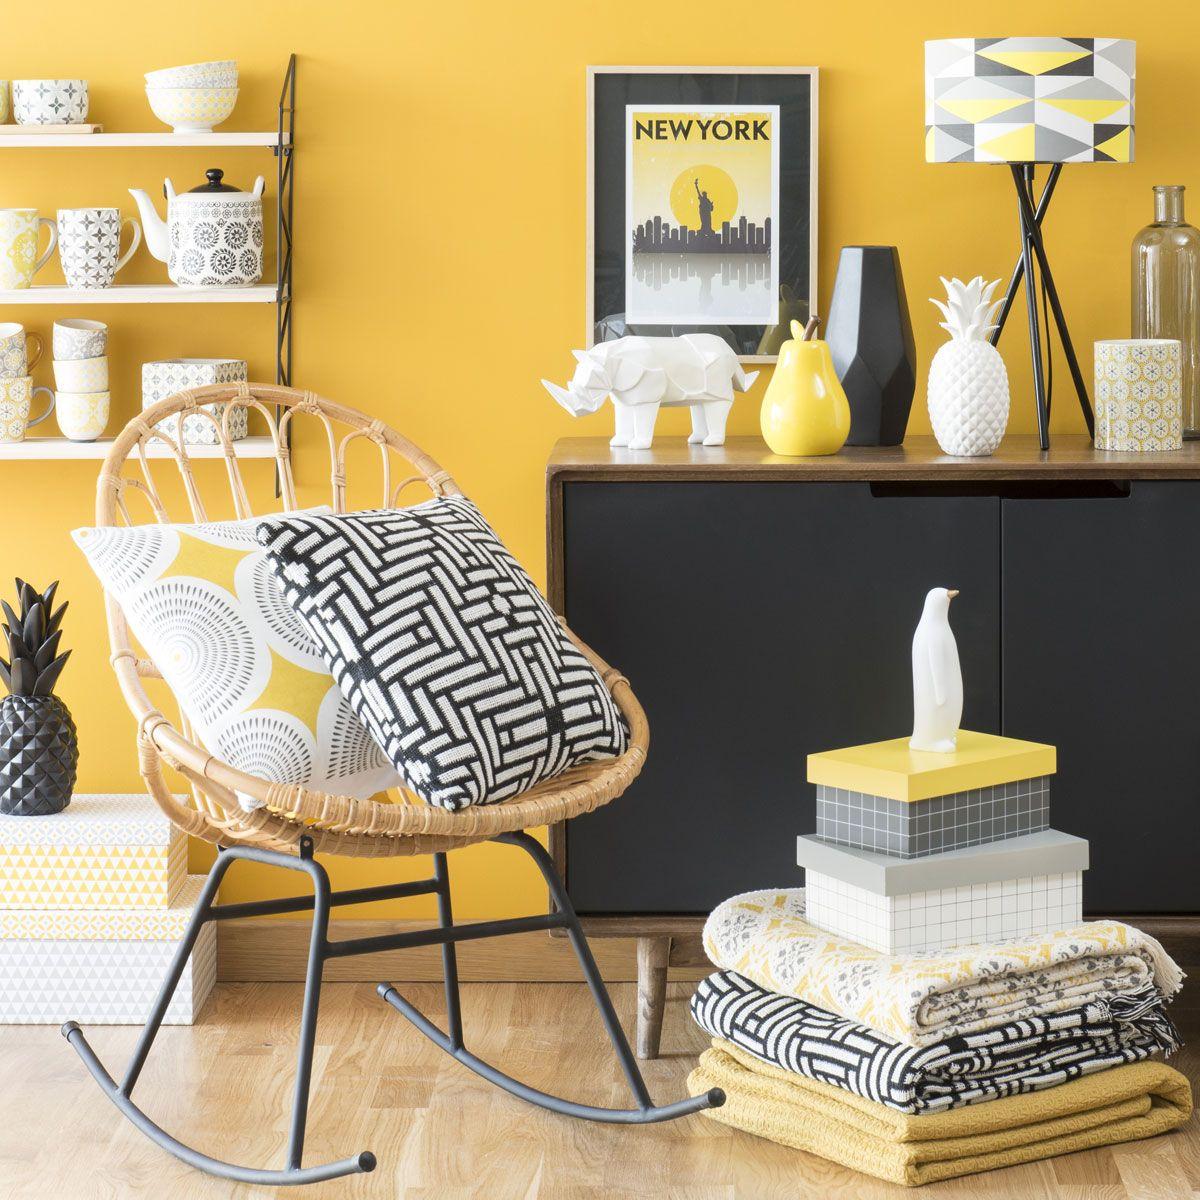 statuette poire en polyr sine jaune h 34 cm king size. Black Bedroom Furniture Sets. Home Design Ideas